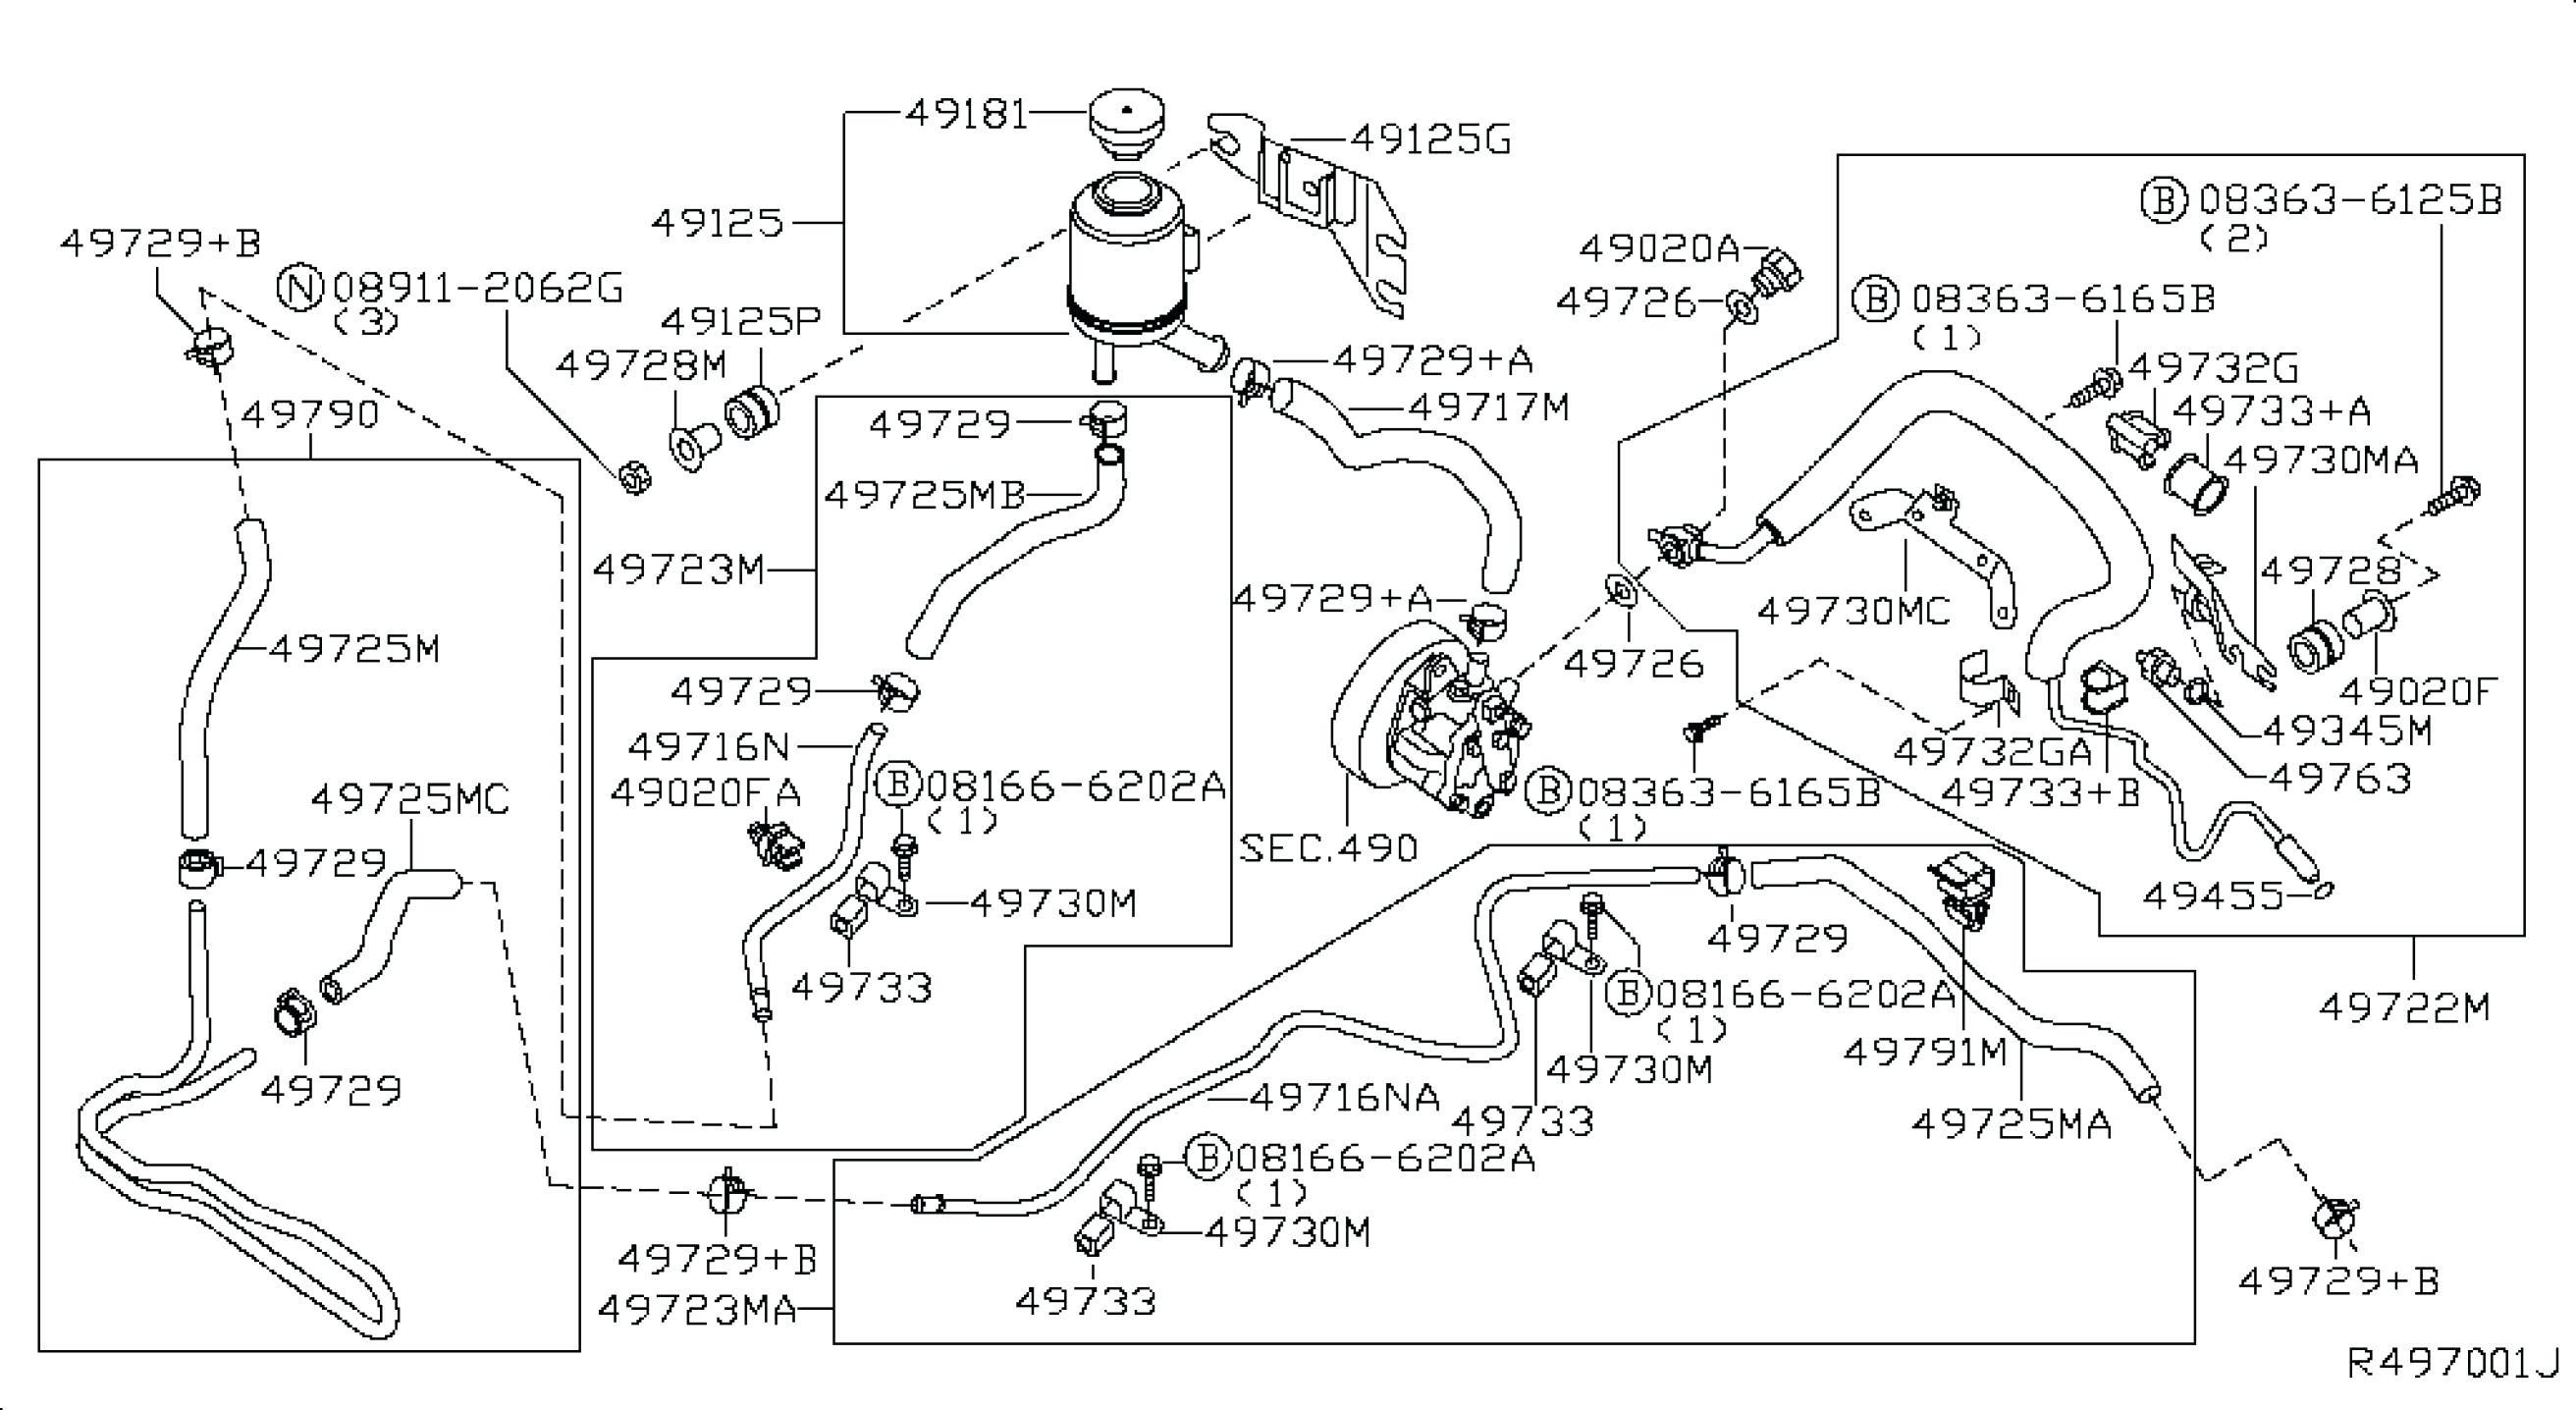 Nissan Engine Diagram Nissan Micra Ignition Wiring Diagram Wiring Diagram Used Of Nissan Engine Diagram